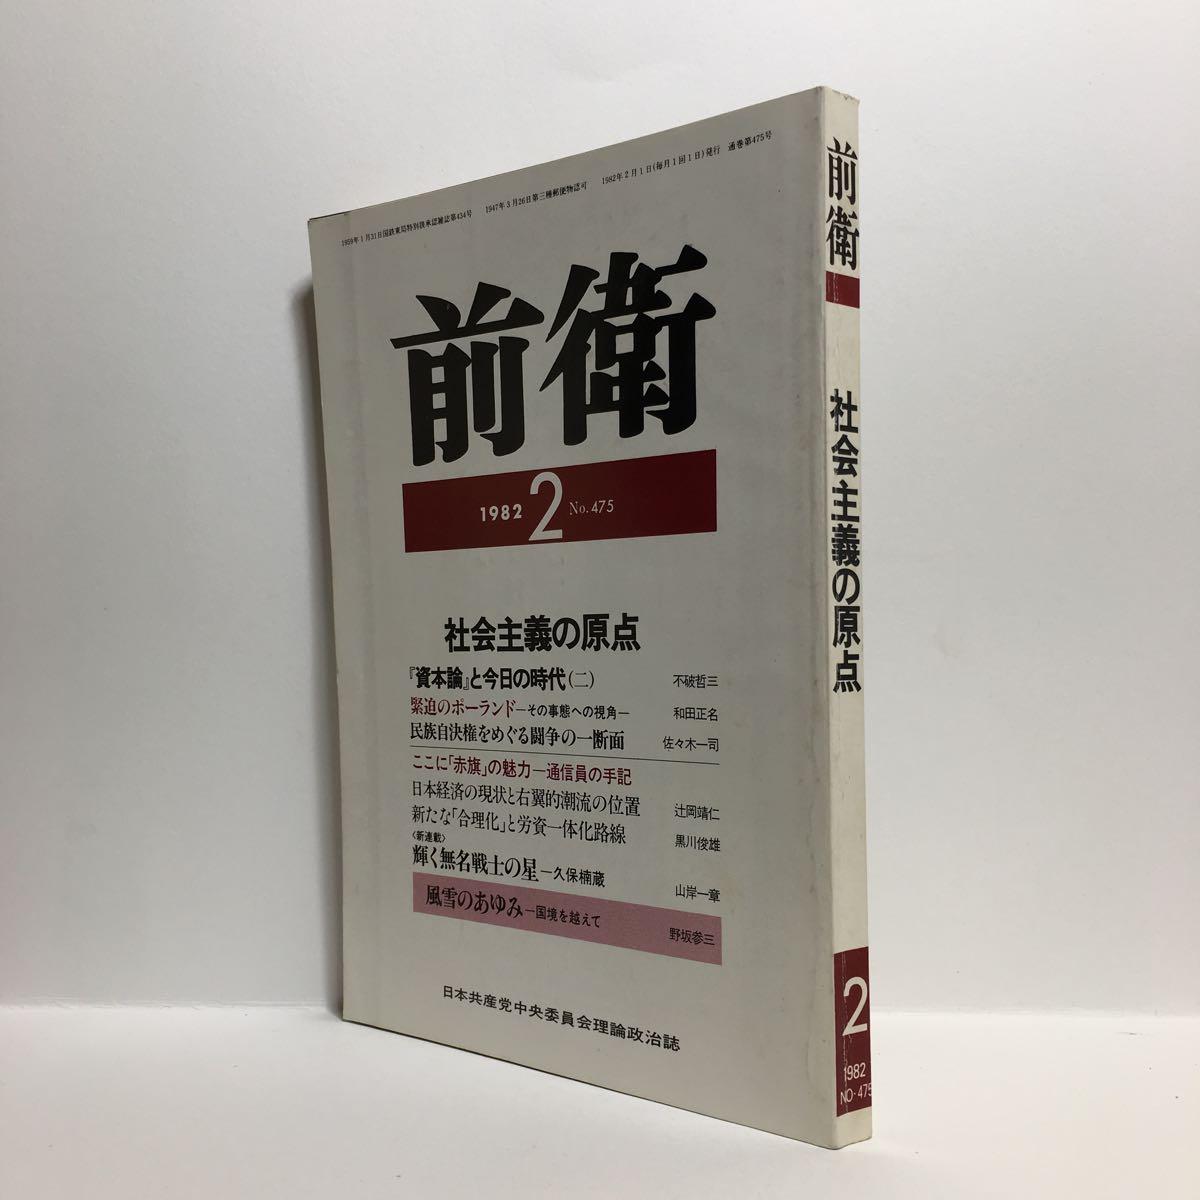 b1/前衛 No.475 1982.2 特集 社会主義の原点 日本共産党中央委員会理論政治誌 ゆうメール送料180円_画像2